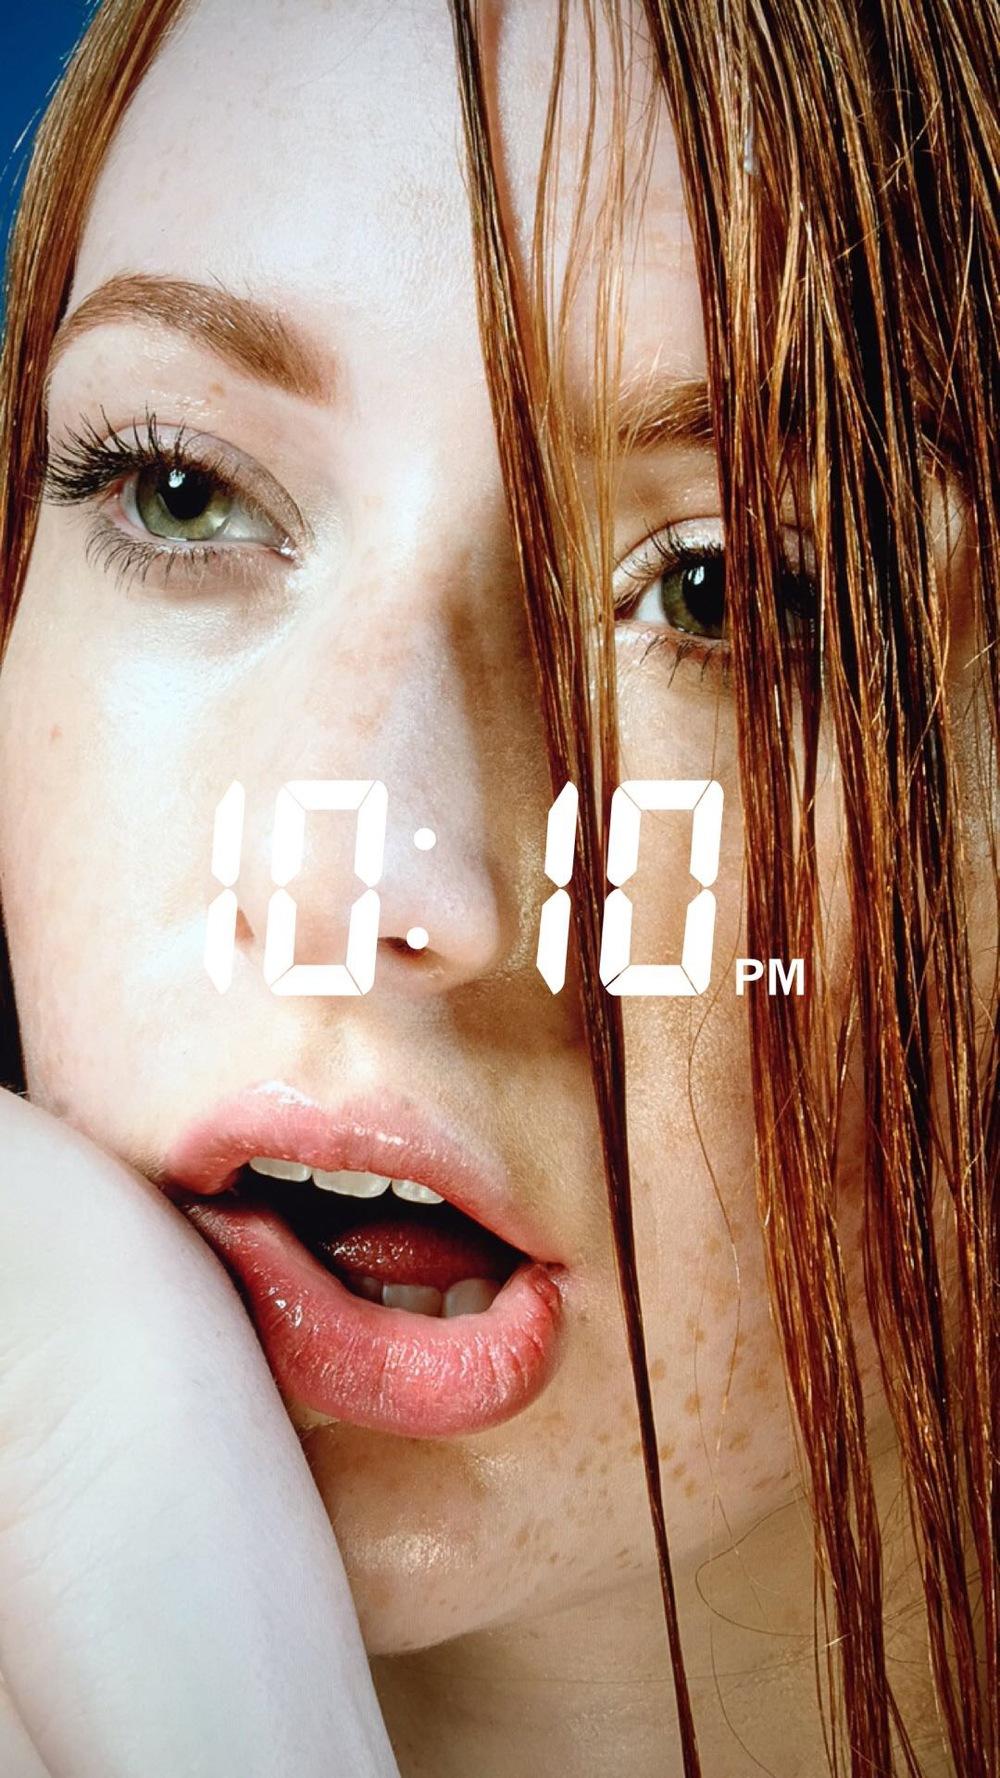 SnapChat: tenphotos